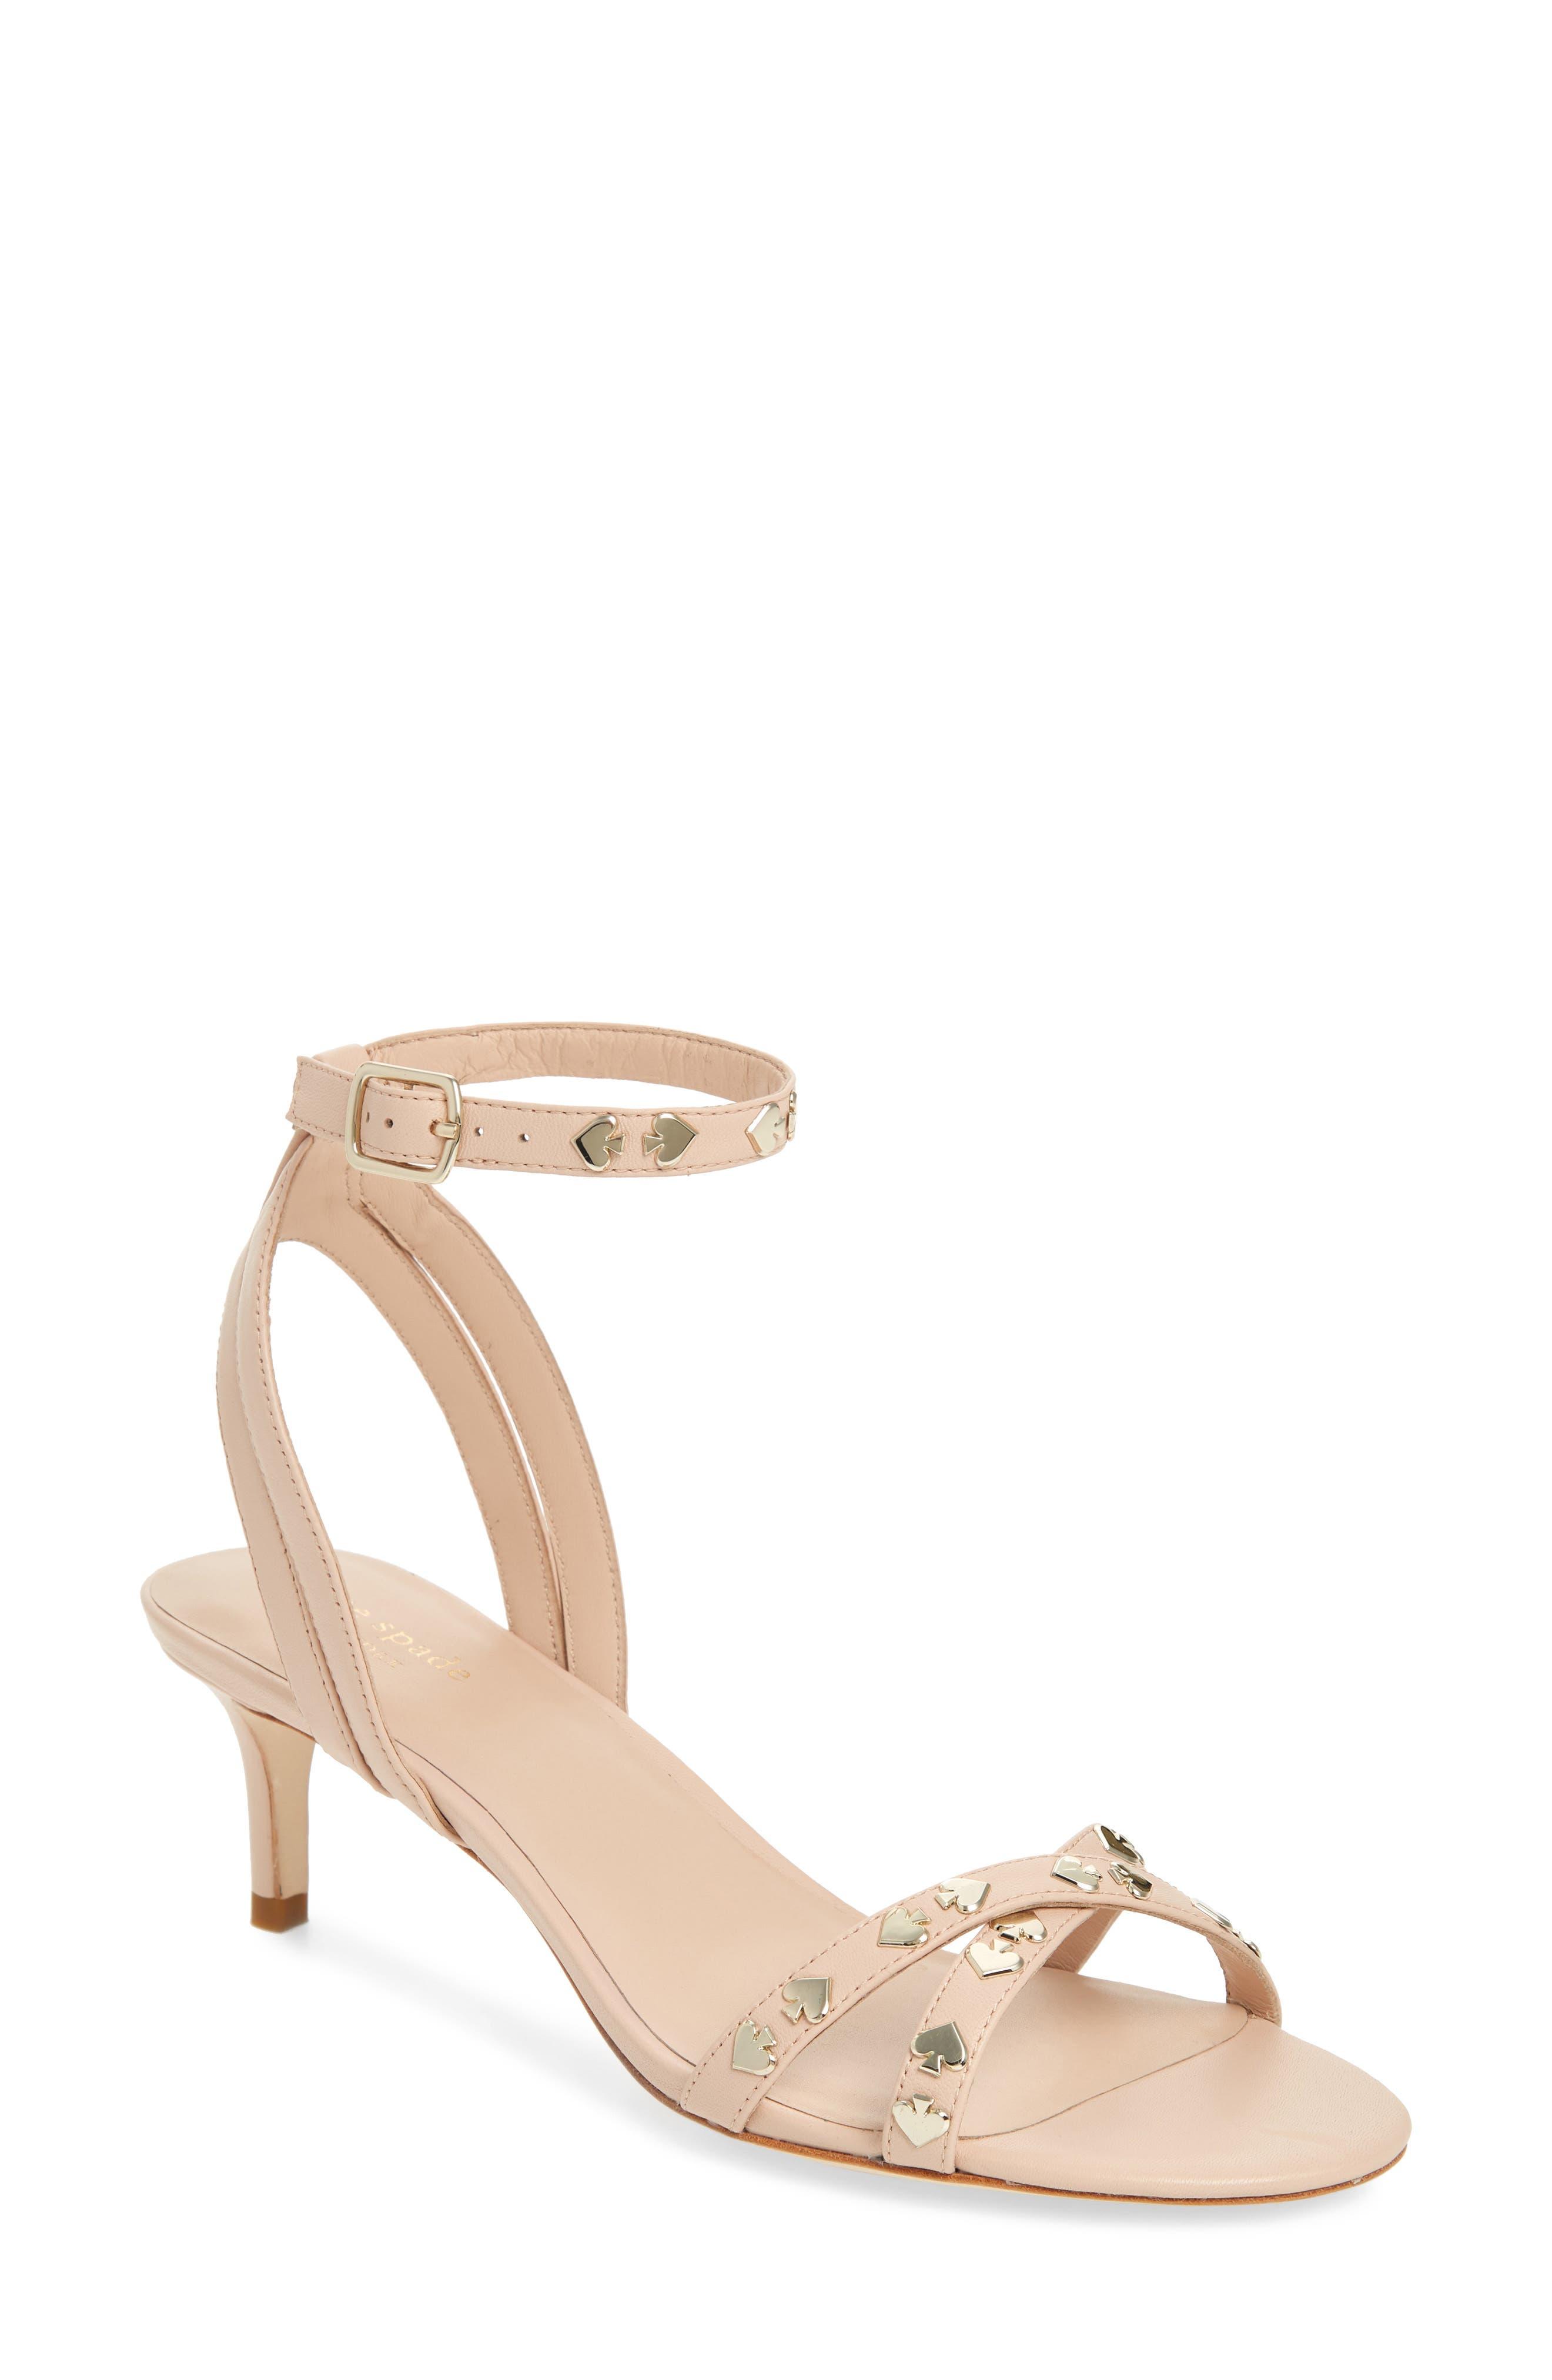 KATE SPADE NEW YORK selma sandal, Main, color, PALE VELUM